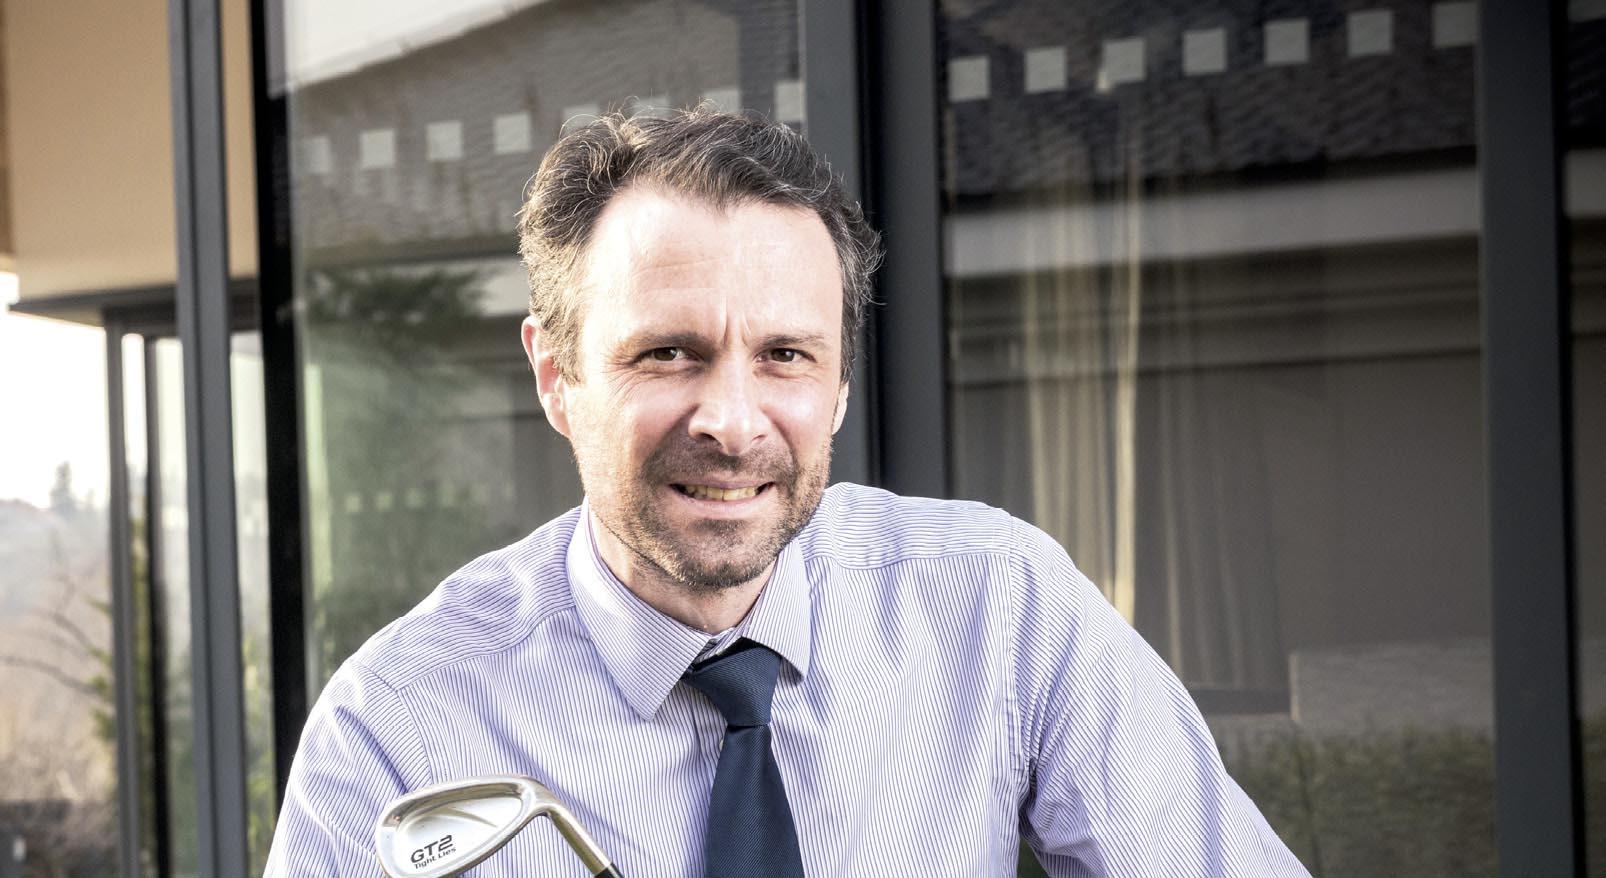 INTERVJU Andrew Dalgleish: 'BRITANSKI INVESTITORI najviše se žale na sporost hrvatskog pravosuđa'